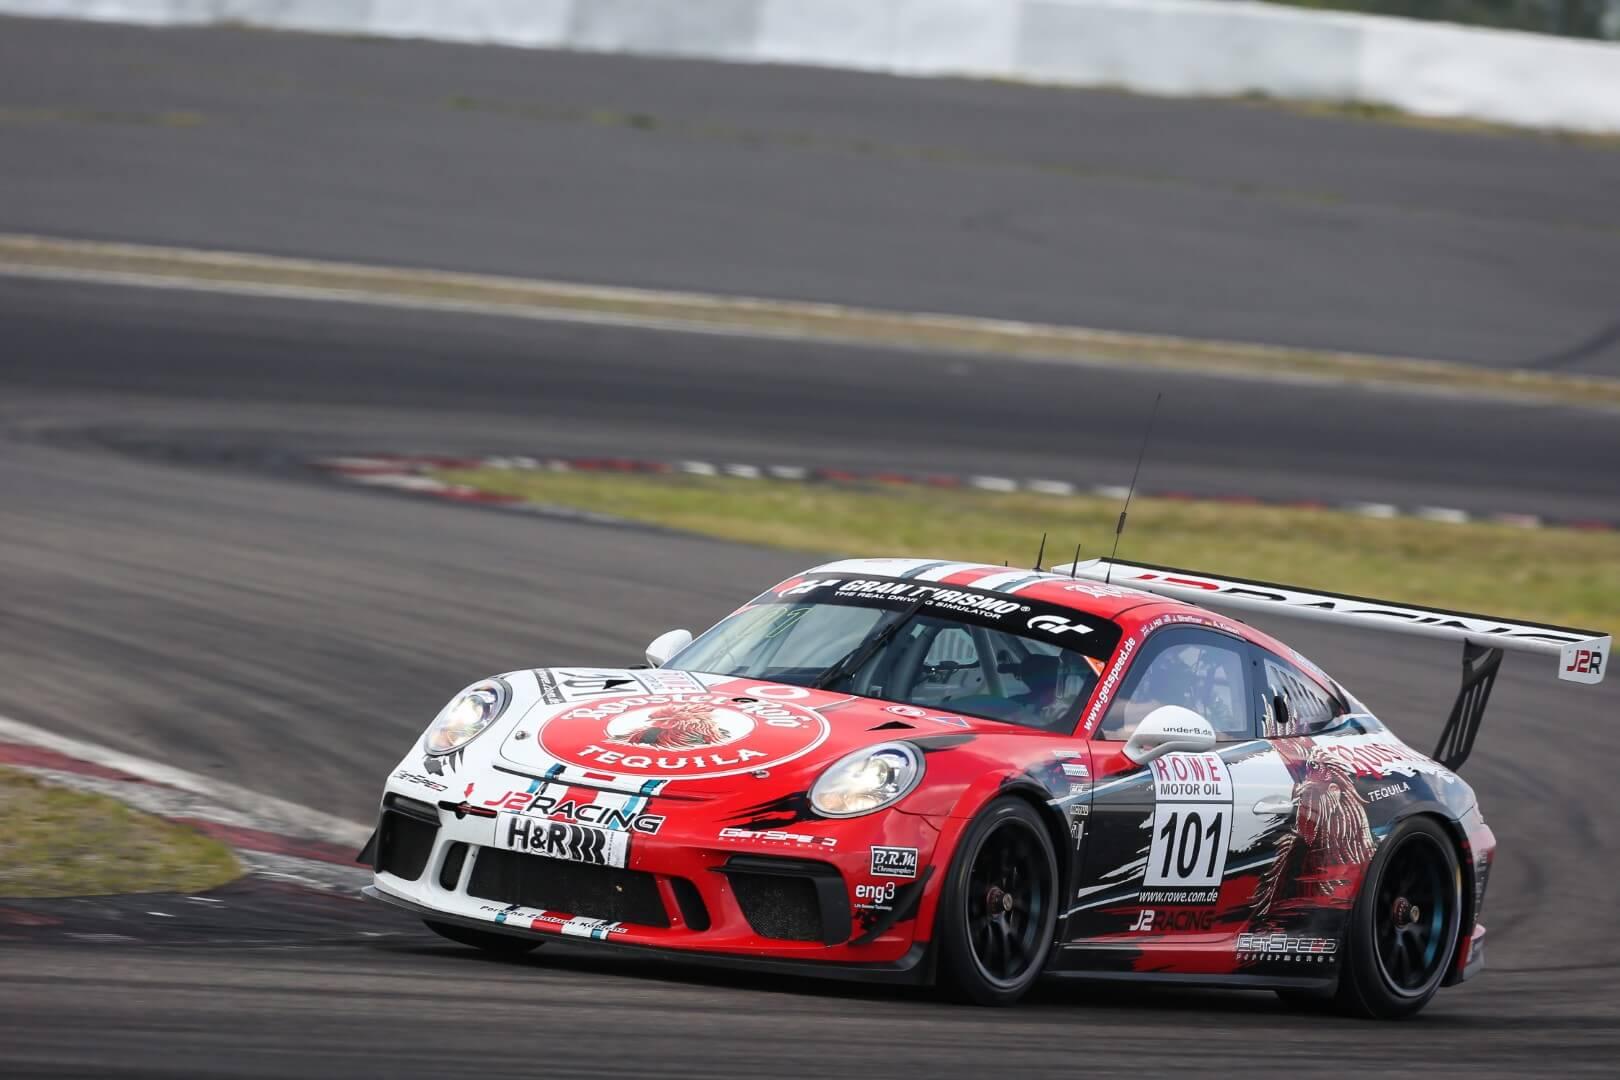 VLN 4. Lauf 2018, Nürburgring-Nordschleife - Foto: Gruppe C Photography; #101 Porsche 911 GT3 Cup, GIGASPEED Team GetSpeed Performance: John Shoffner, Janine Hill, Arno Klasen